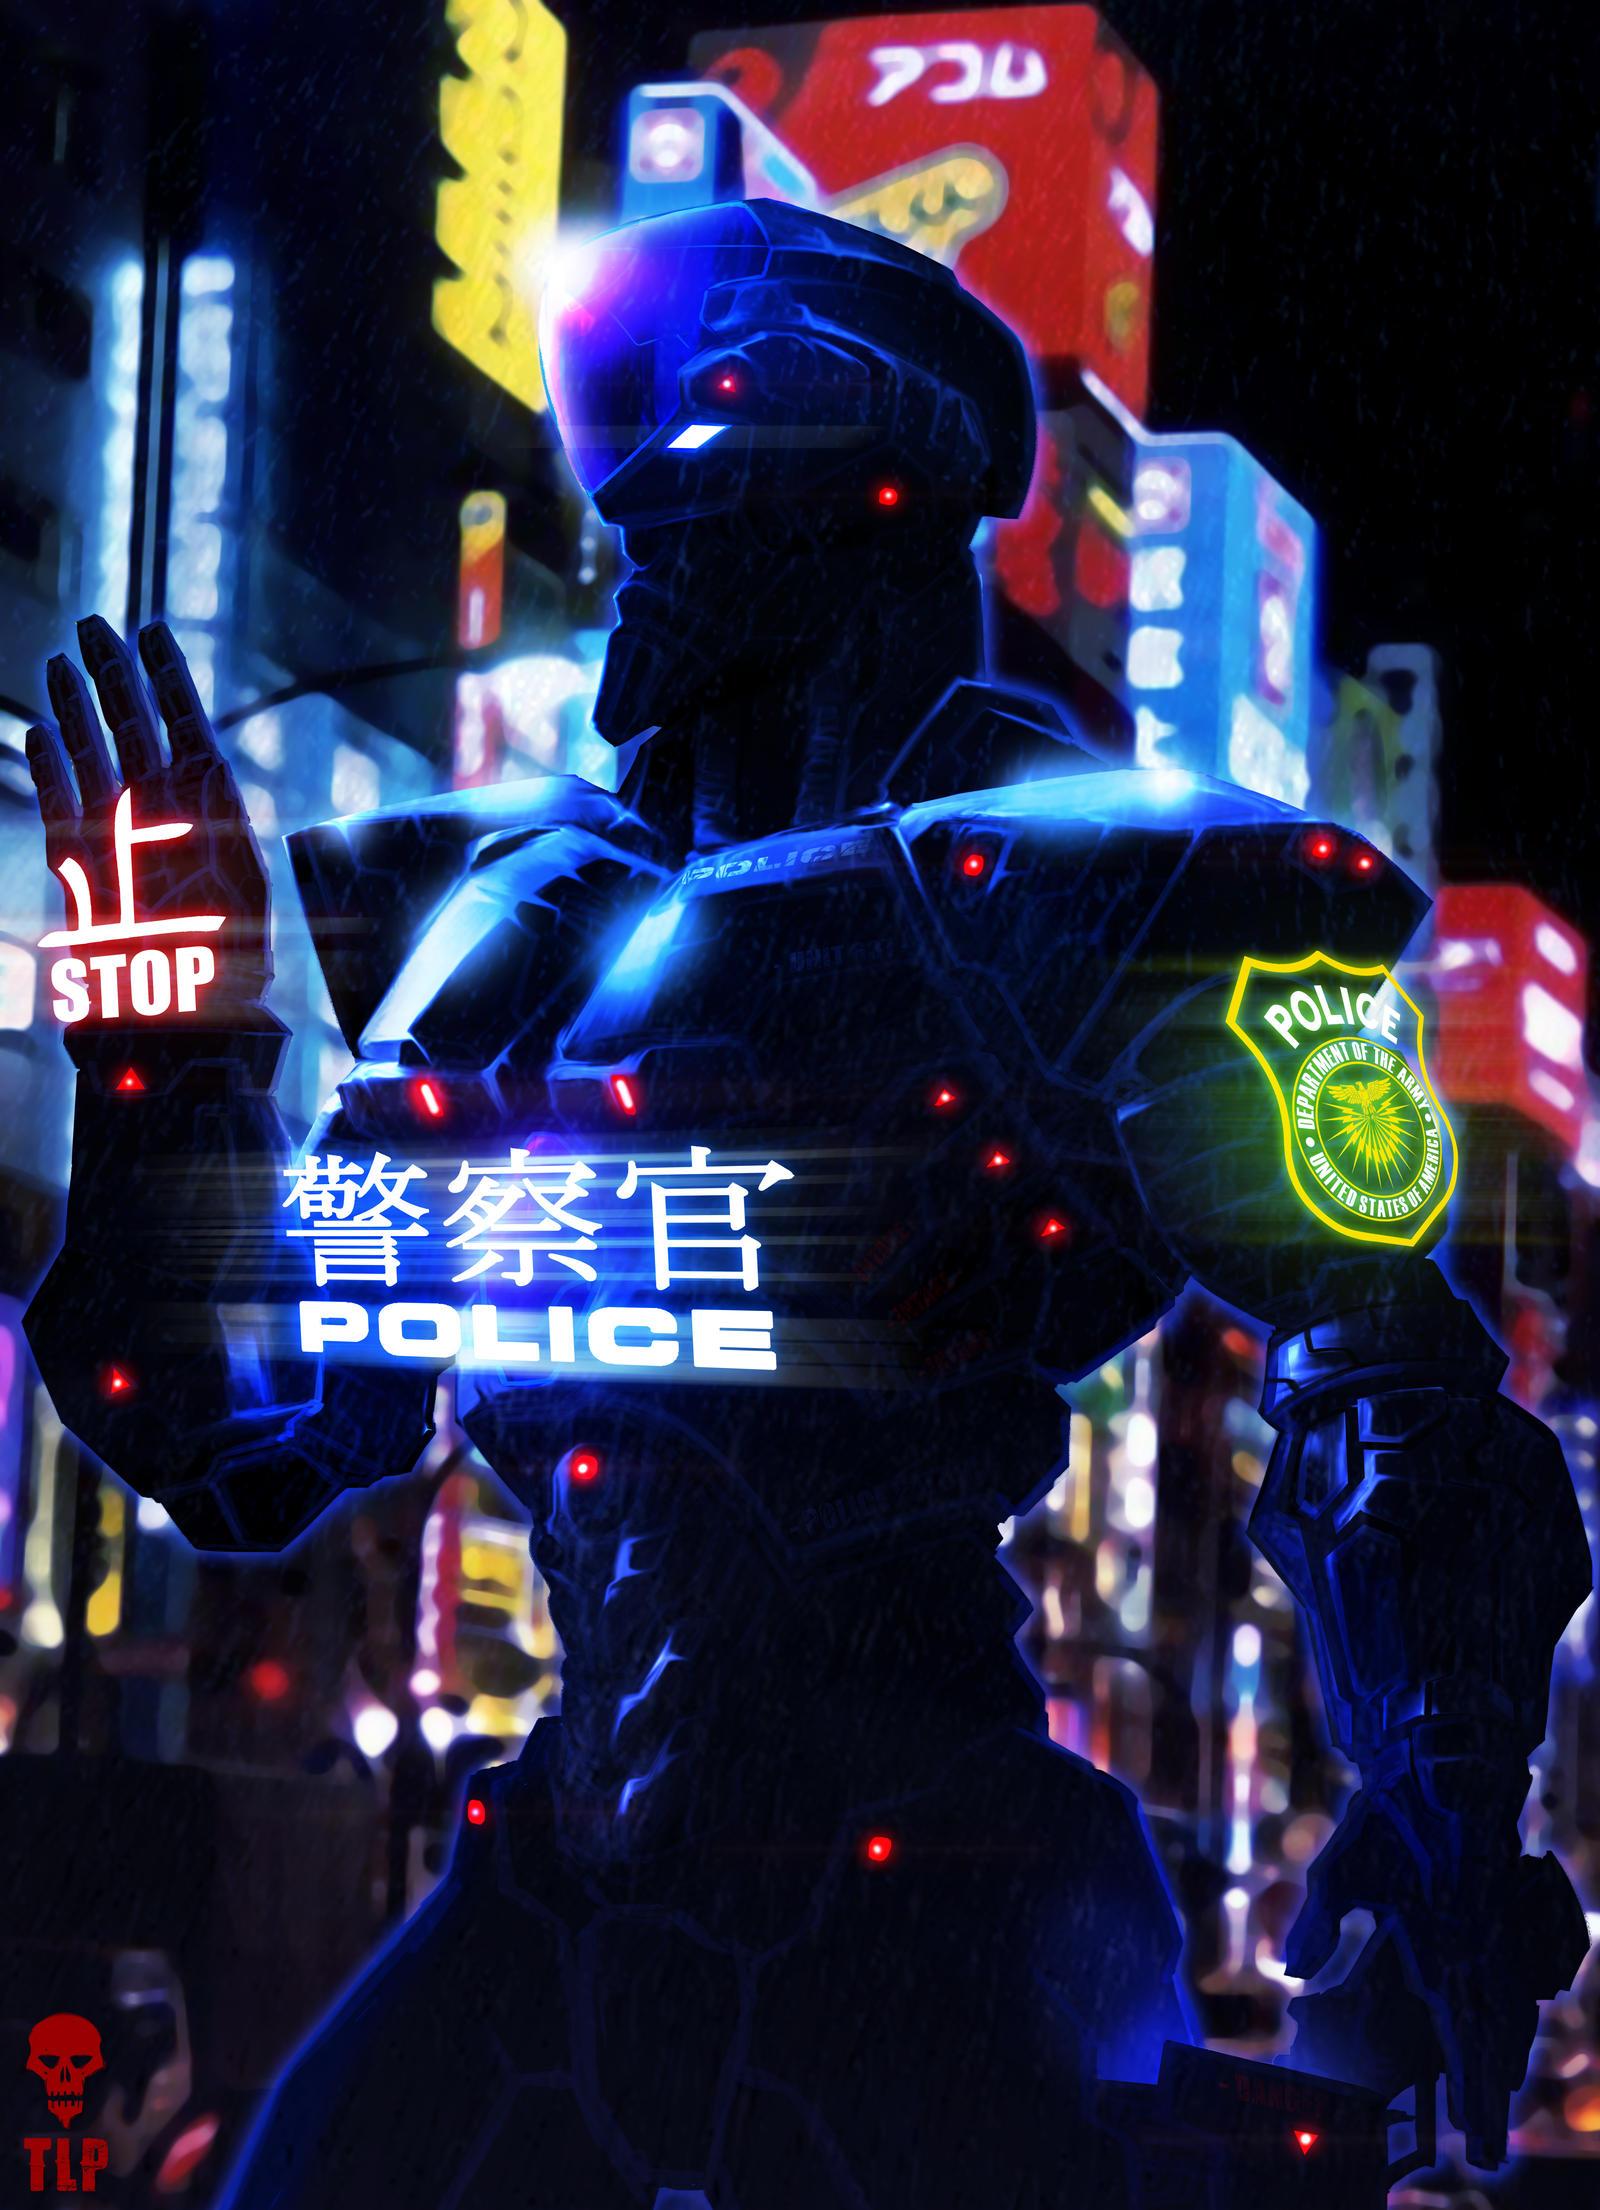 ADRIEL - Police Robot Enforcer by The-Last-Phantom